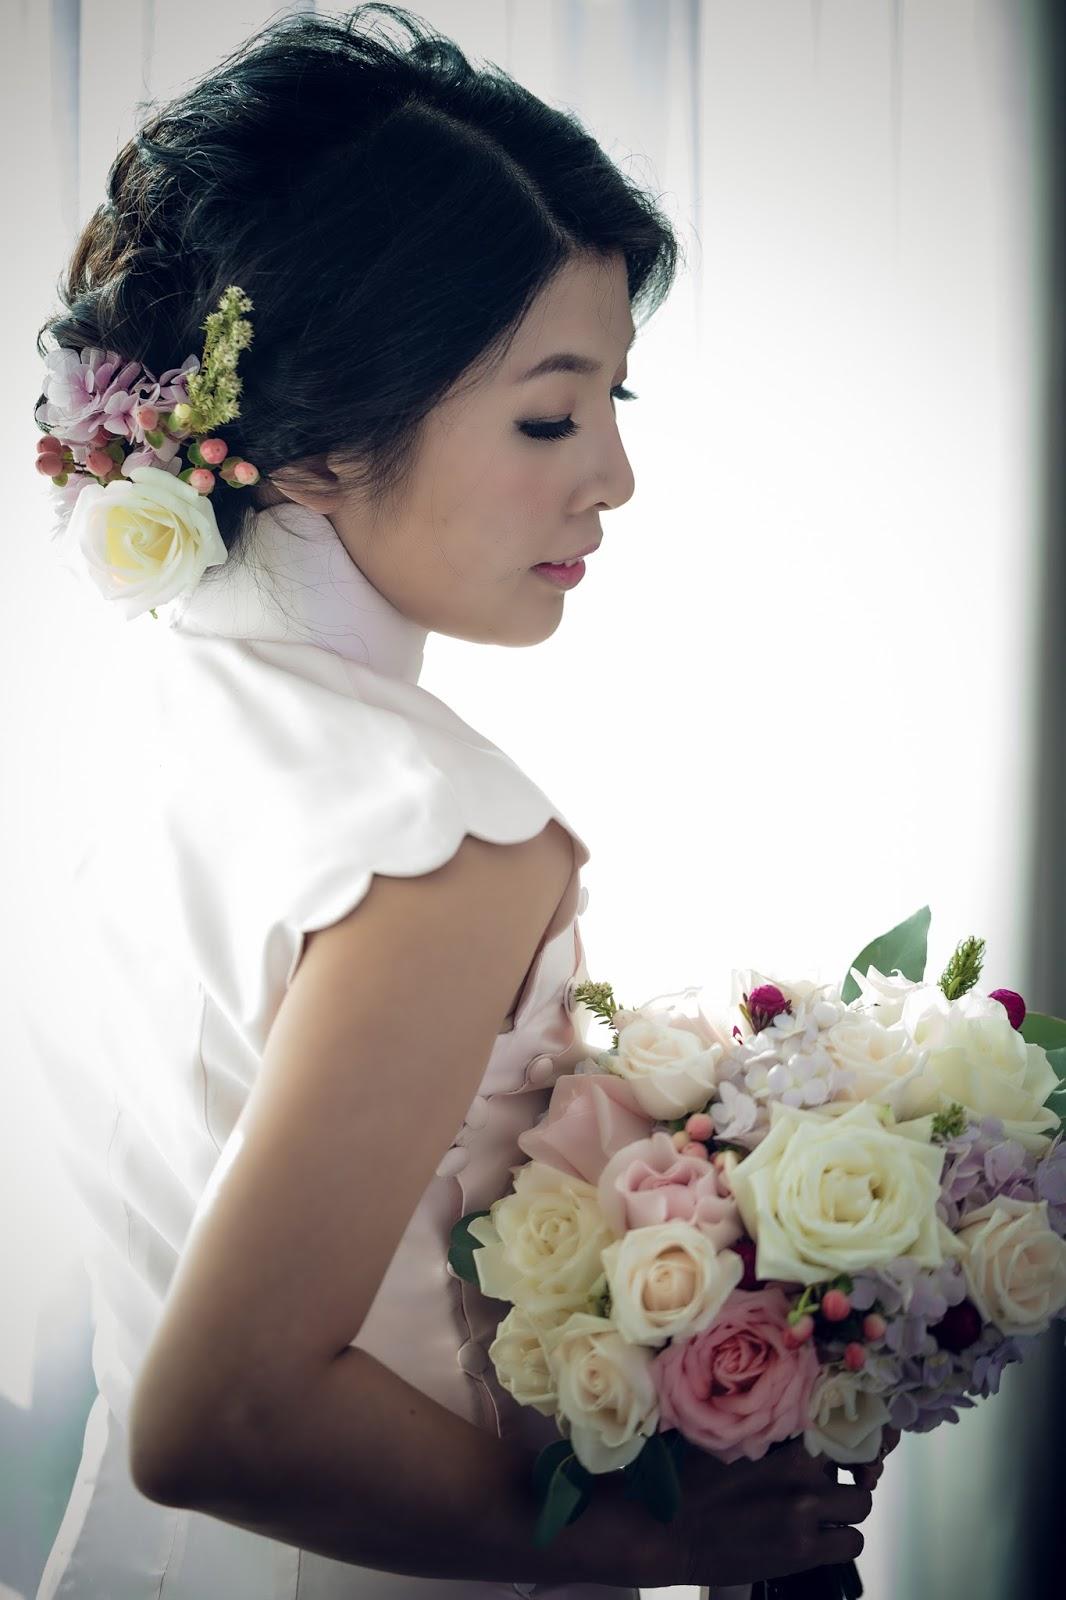 Wedding Research Malaysia: January 2017